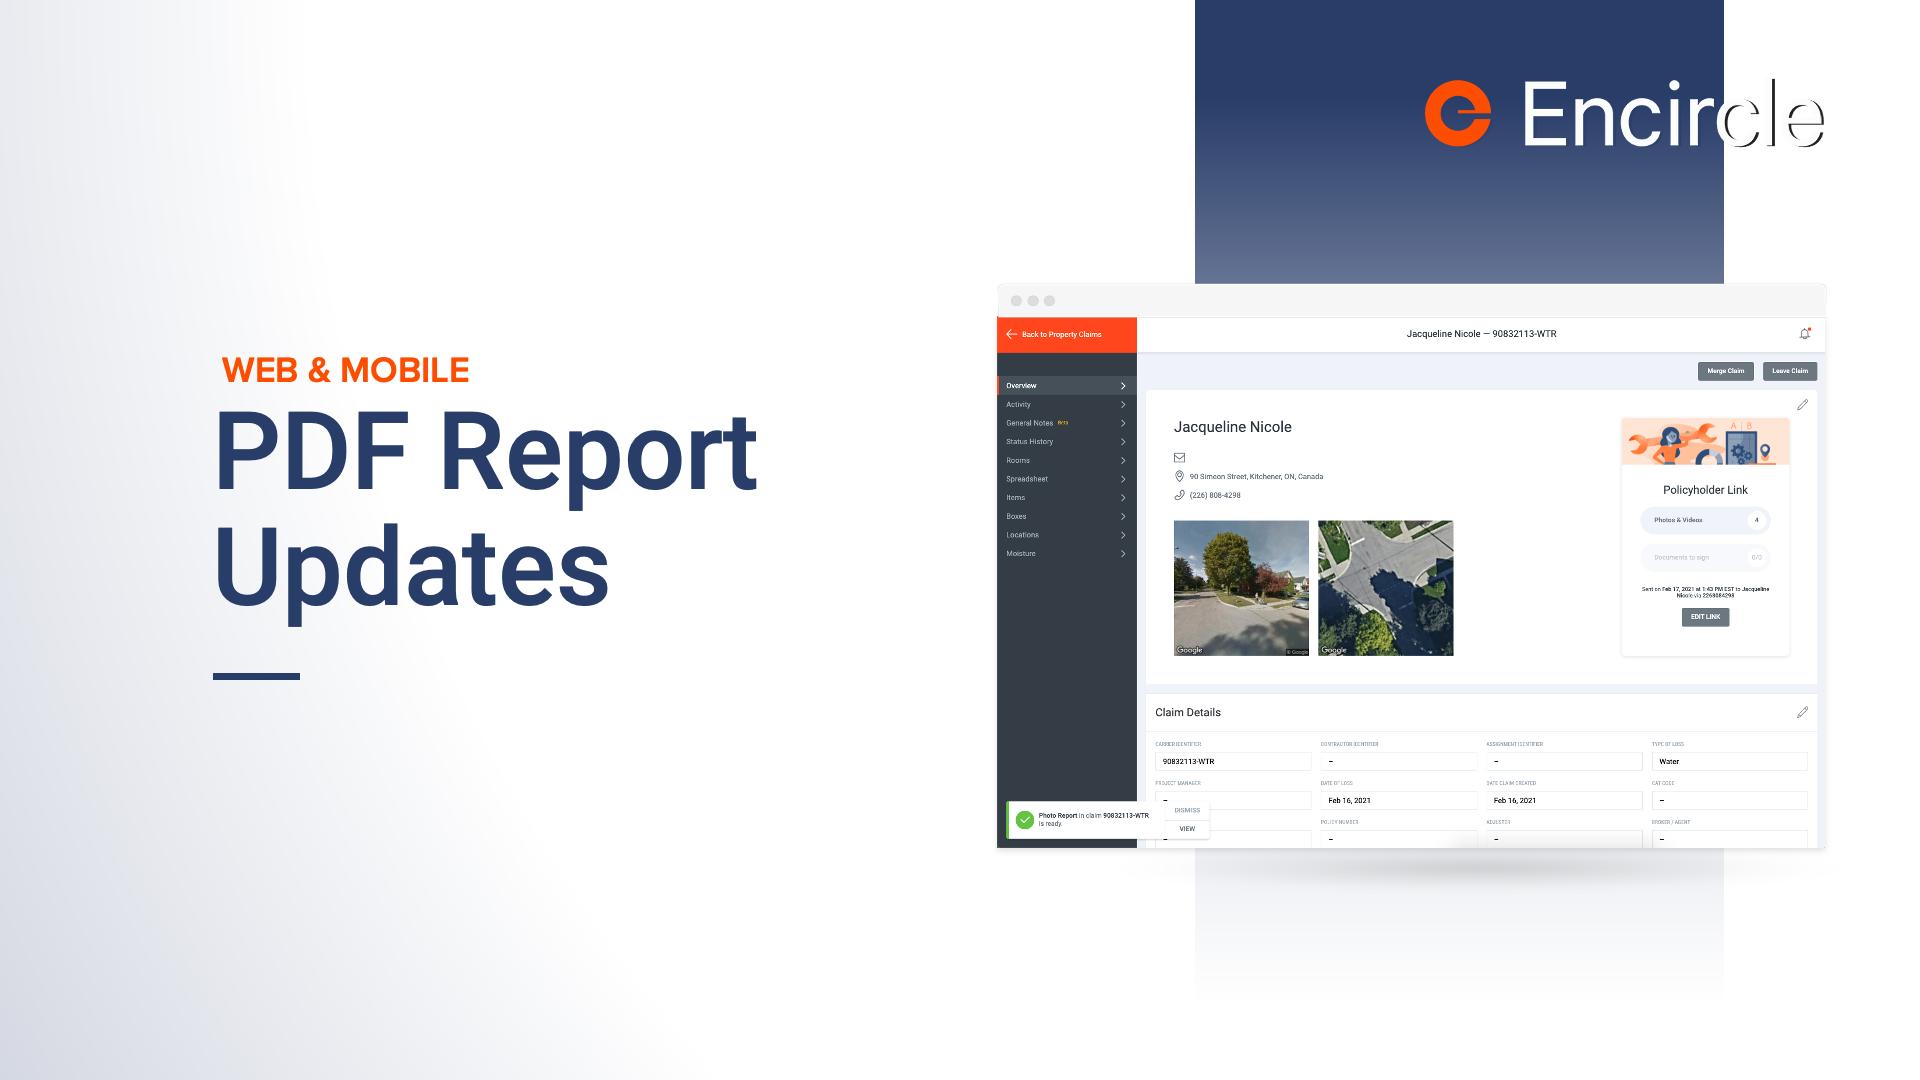 3-PDF-Report-Updates-Whats-New-at-Encircle-Webinar